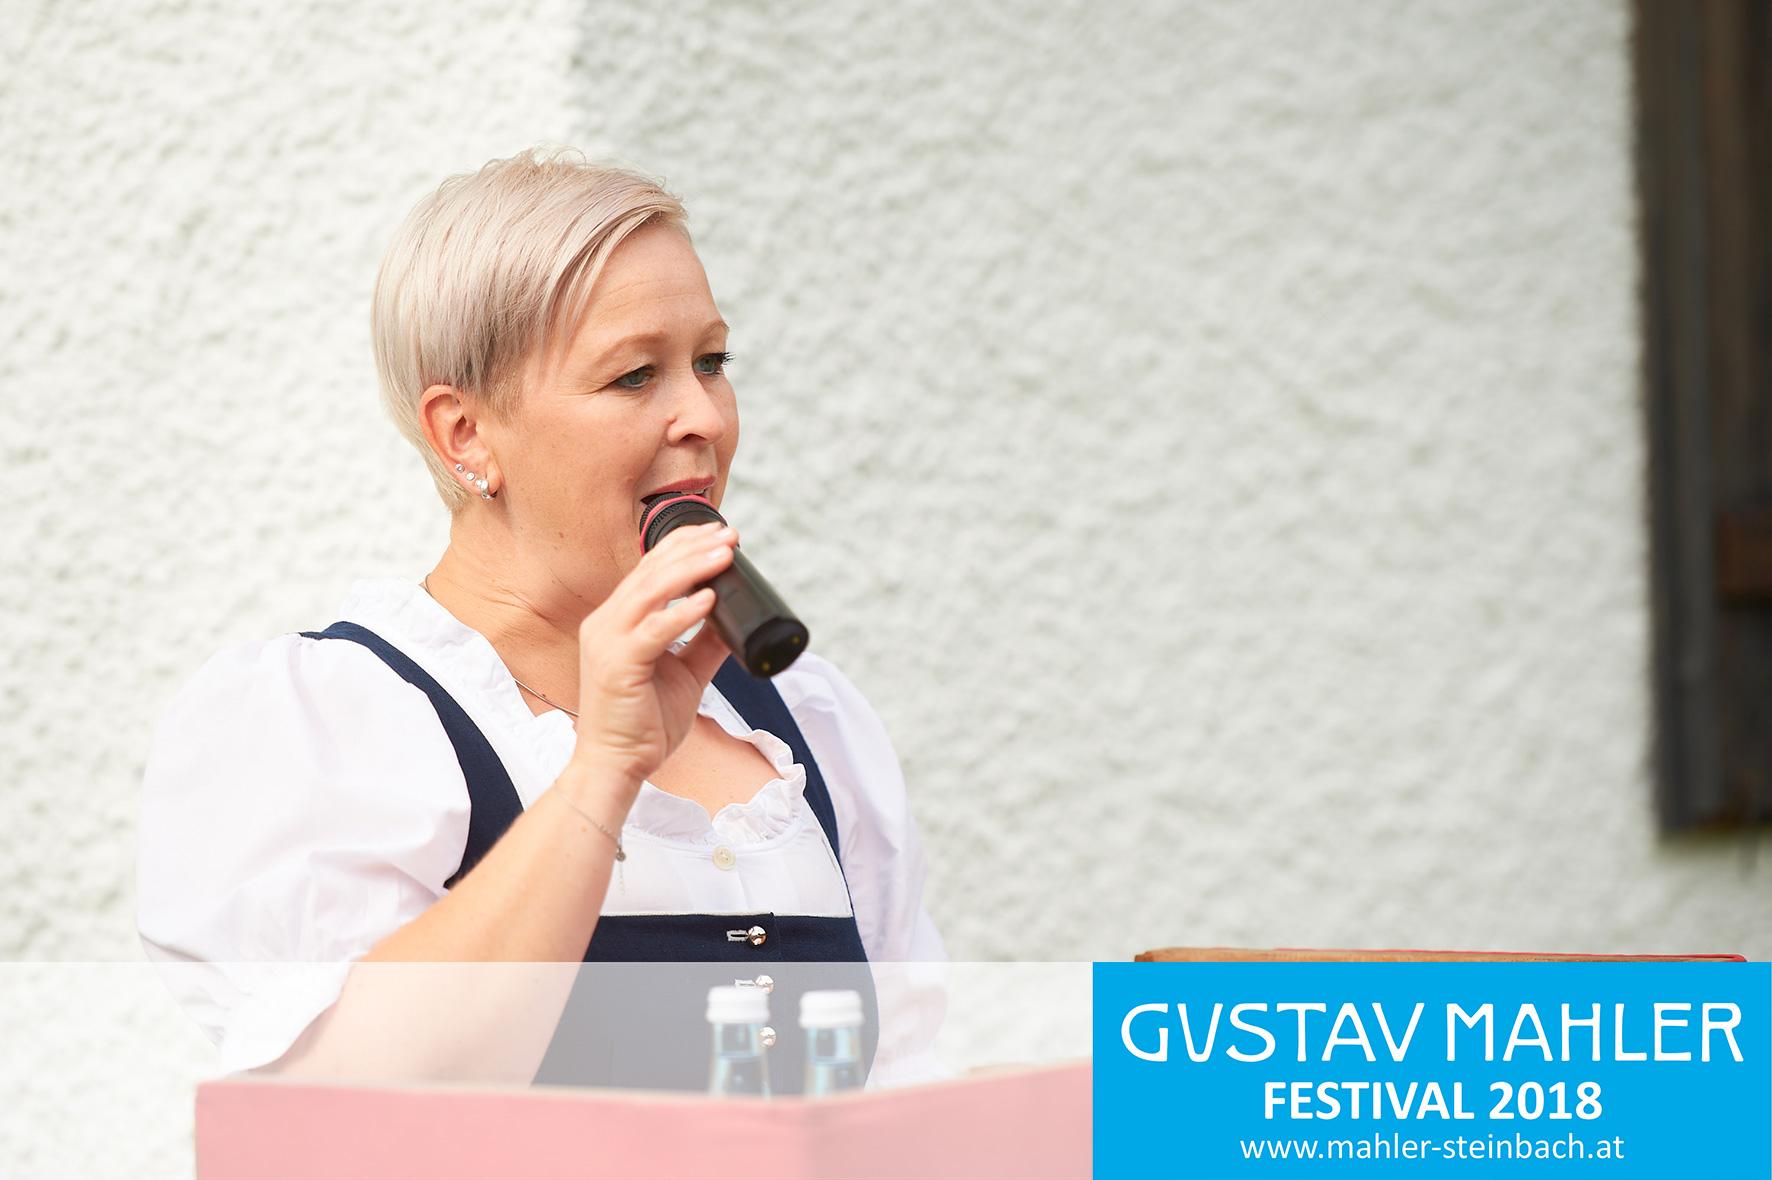 Bgm. Nicole Eder, Eröffnung, 3. Gustav Mahler Festival Steinbach